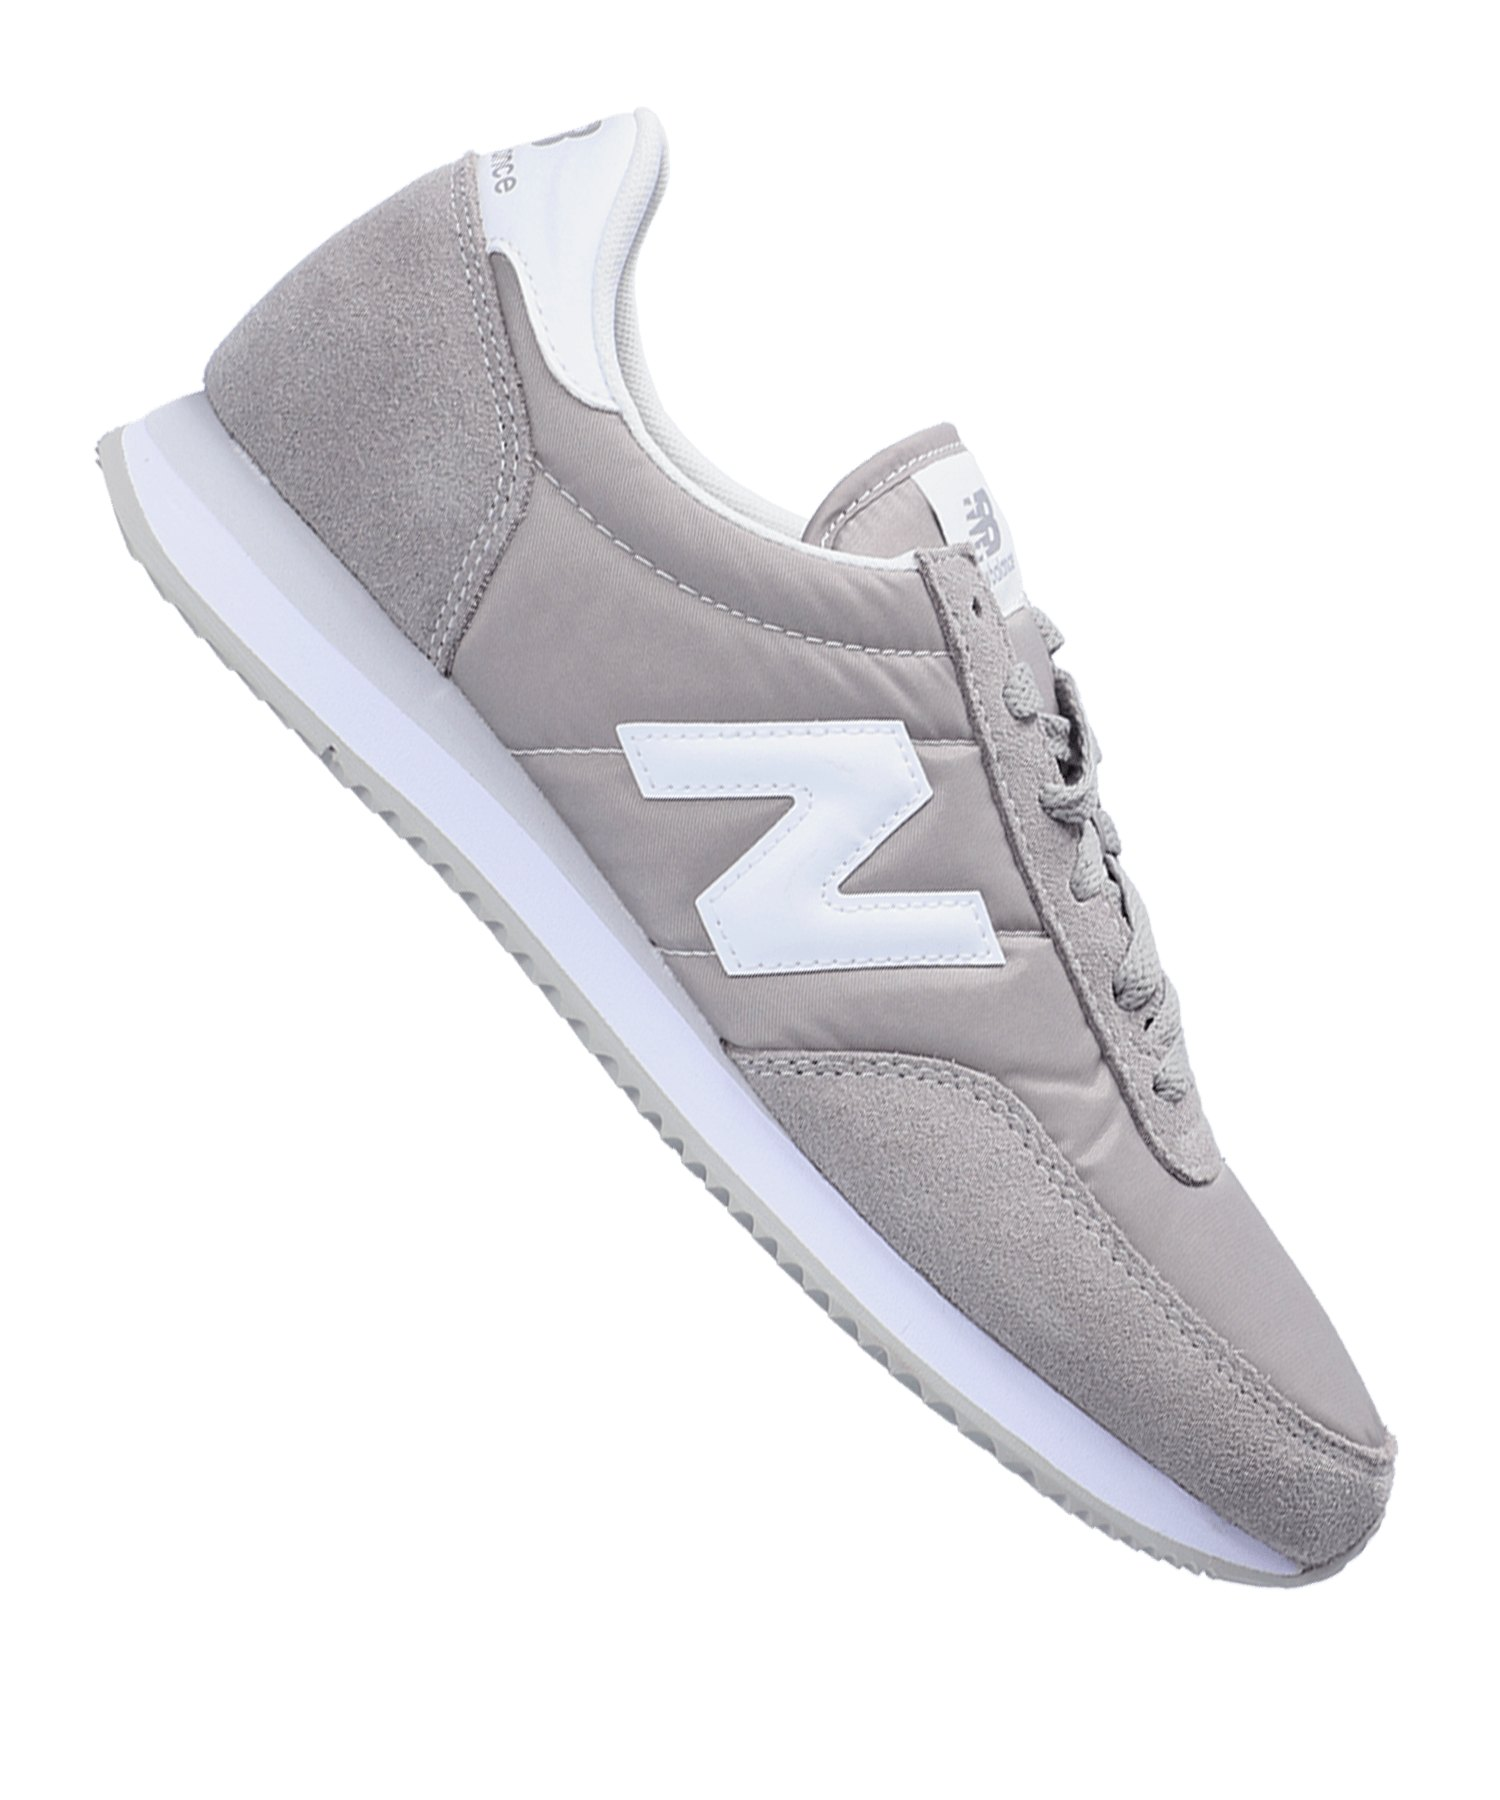 New Balance UL720 D Sneaker Grau F12 - grau